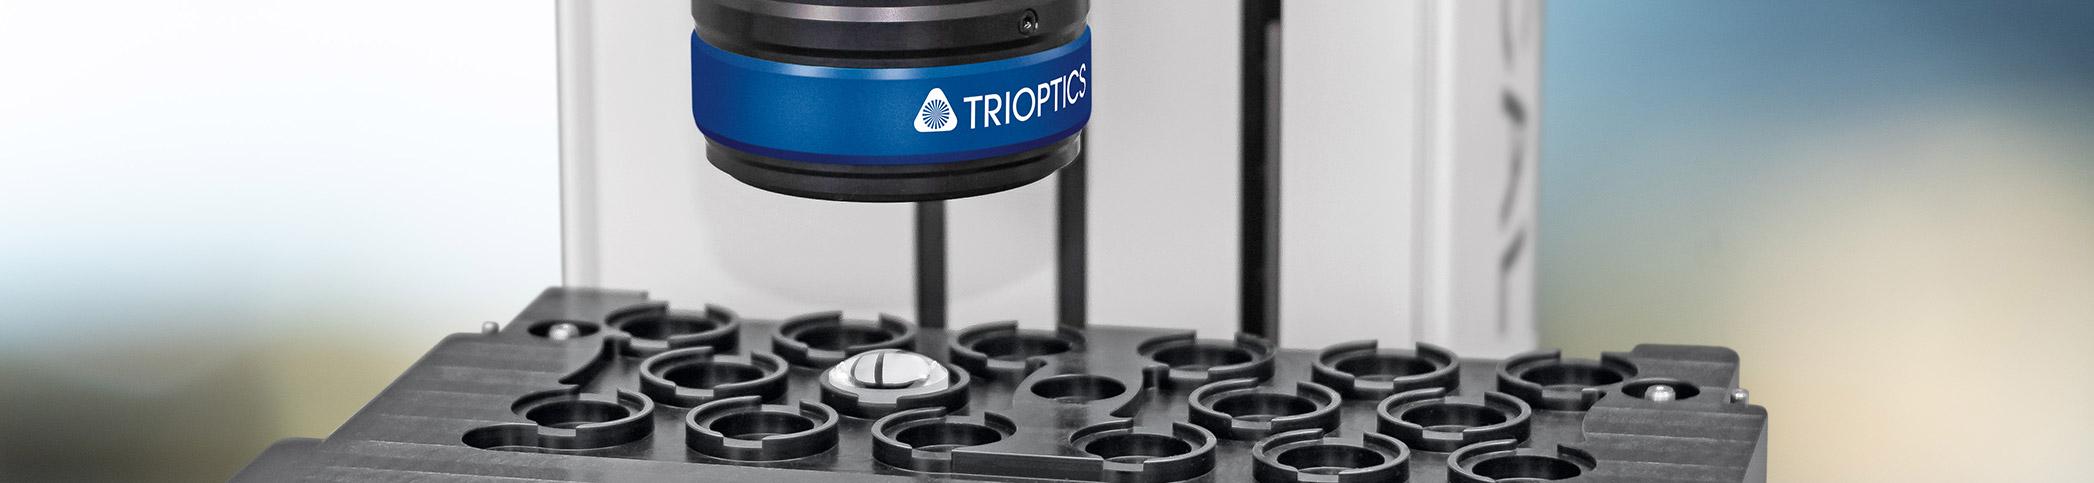 TRIOPTICS Applications µPhase®